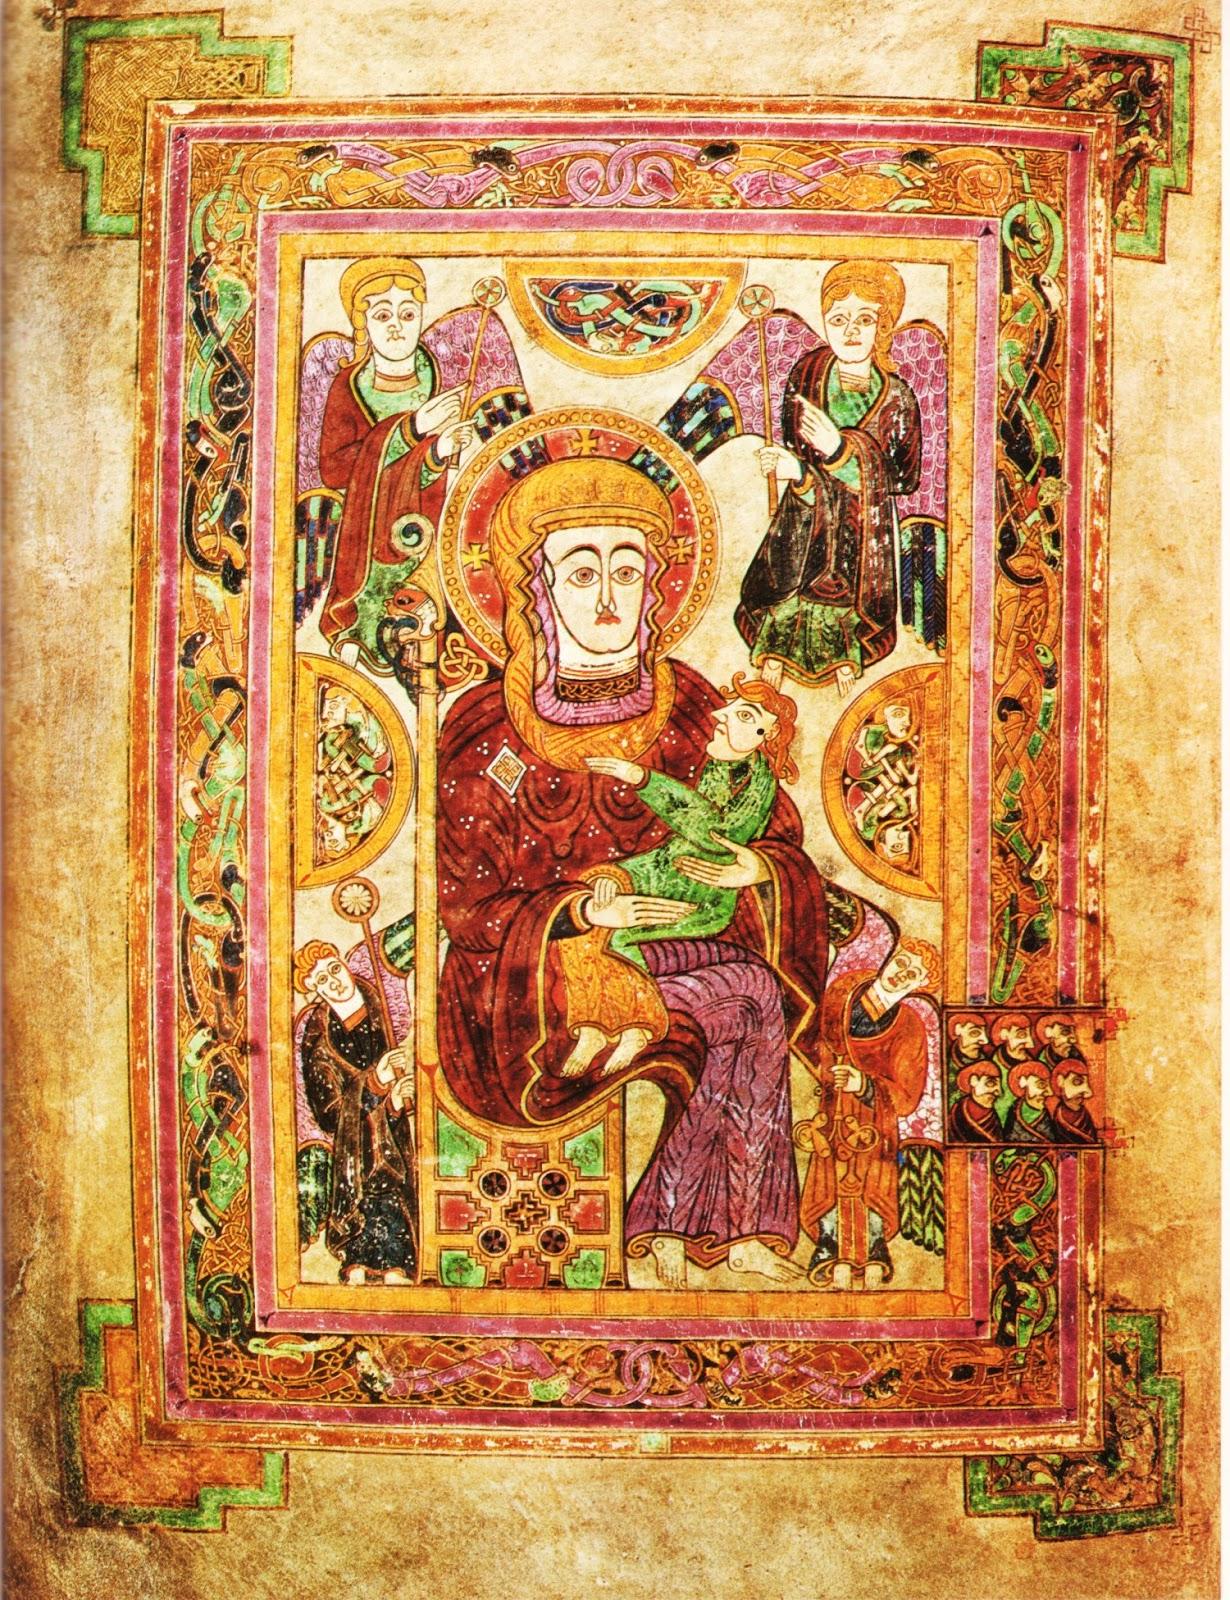 http://2.bp.blogspot.com/-6VSeXfLDw-M/UBXvB4q5iSI/AAAAAAAA_yg/b2AcocZRxdI/s1600/800s+Madonna+and+Child+Book+of+Kells+folio+7v++Trinity+College,+Dublin.jpg